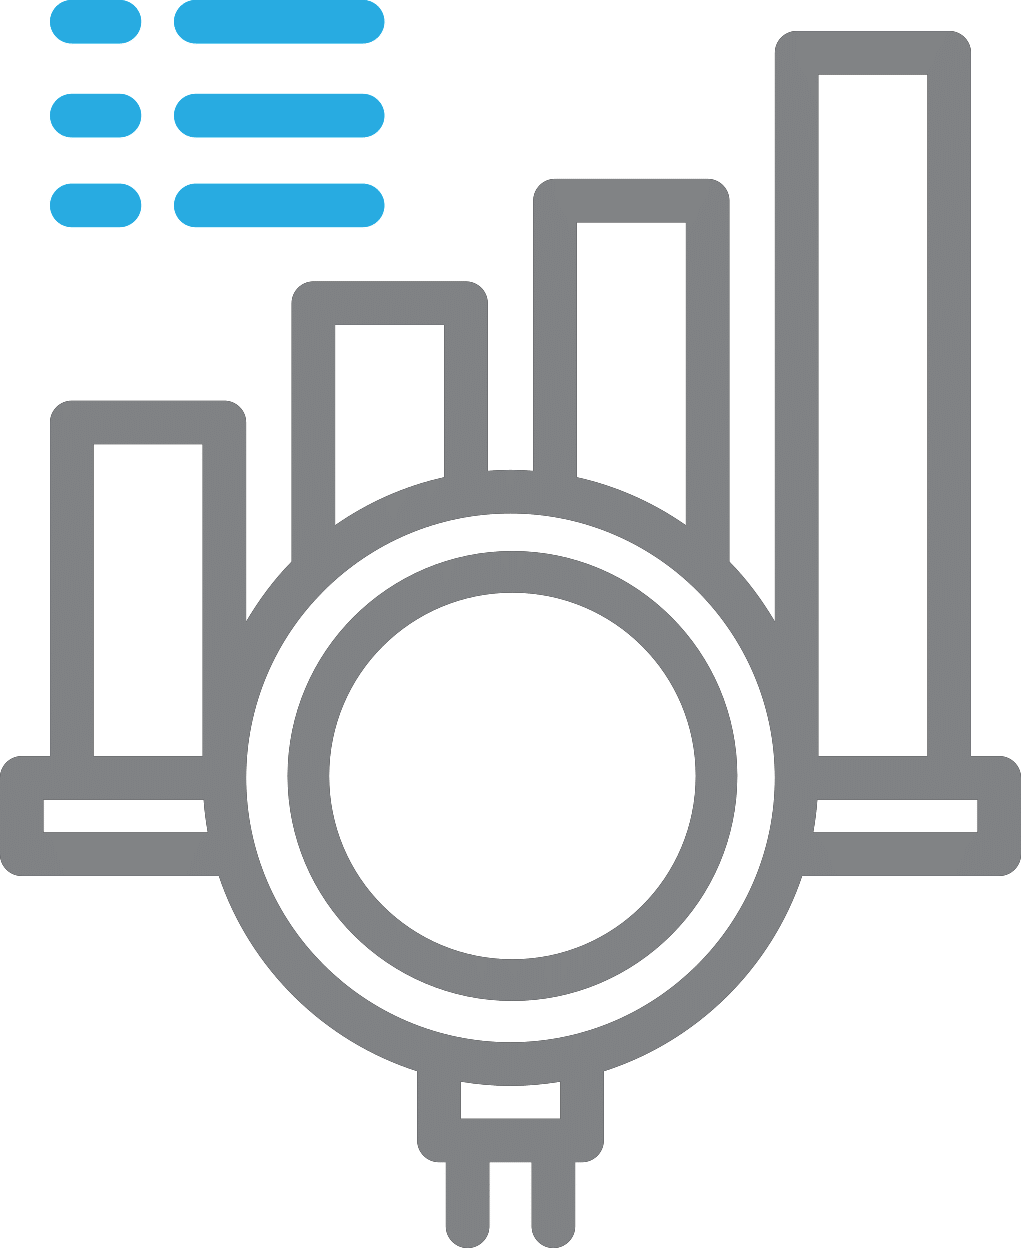 Side Scan Sonar, Dredging, Hydrographic survey, Hydrographic Data Analysis